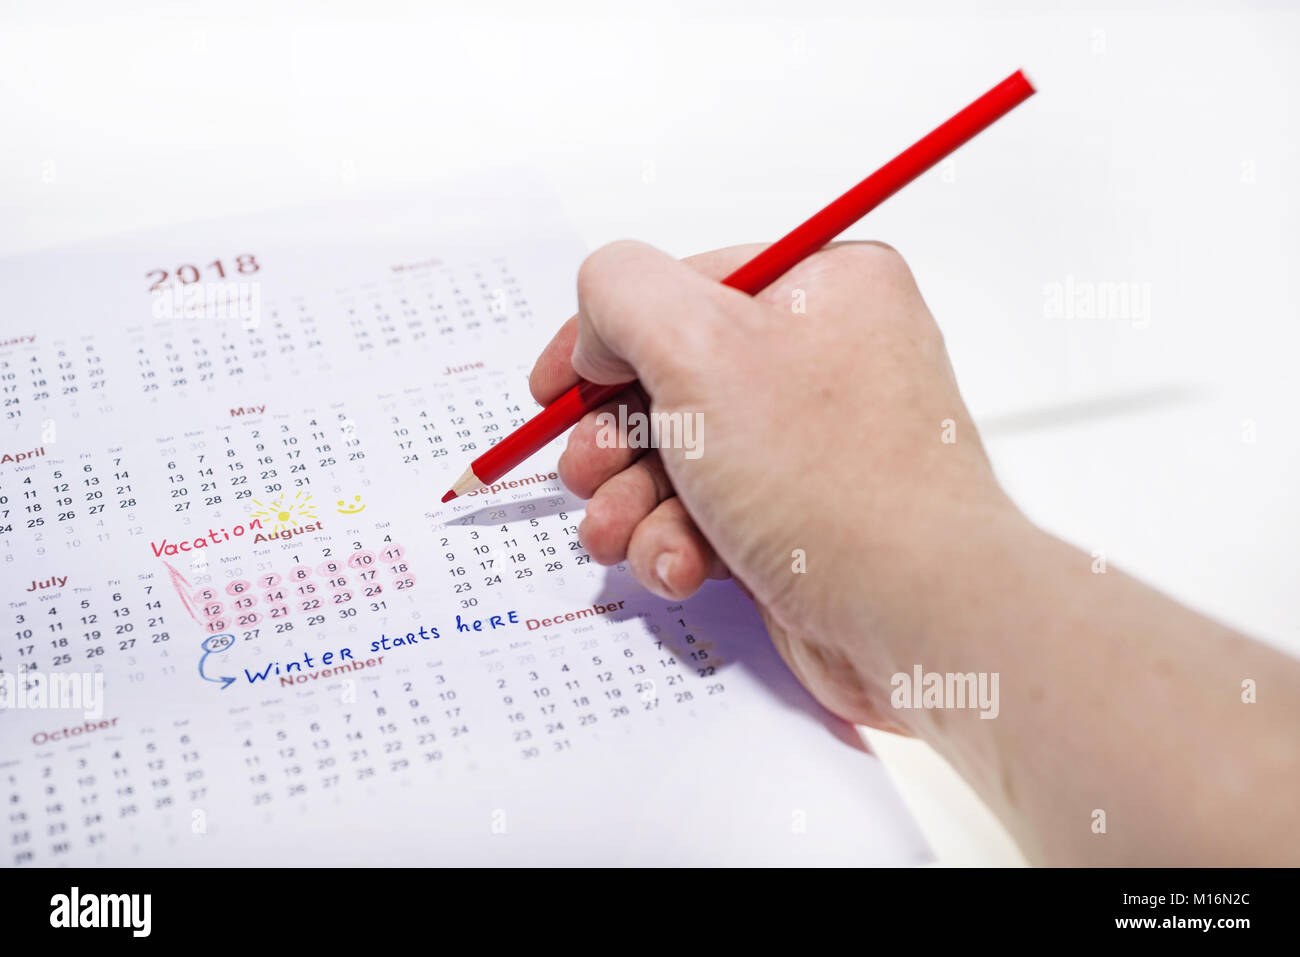 Urlaub Kalender des Jahres 2018. Abstrakte Idee. Stockbild